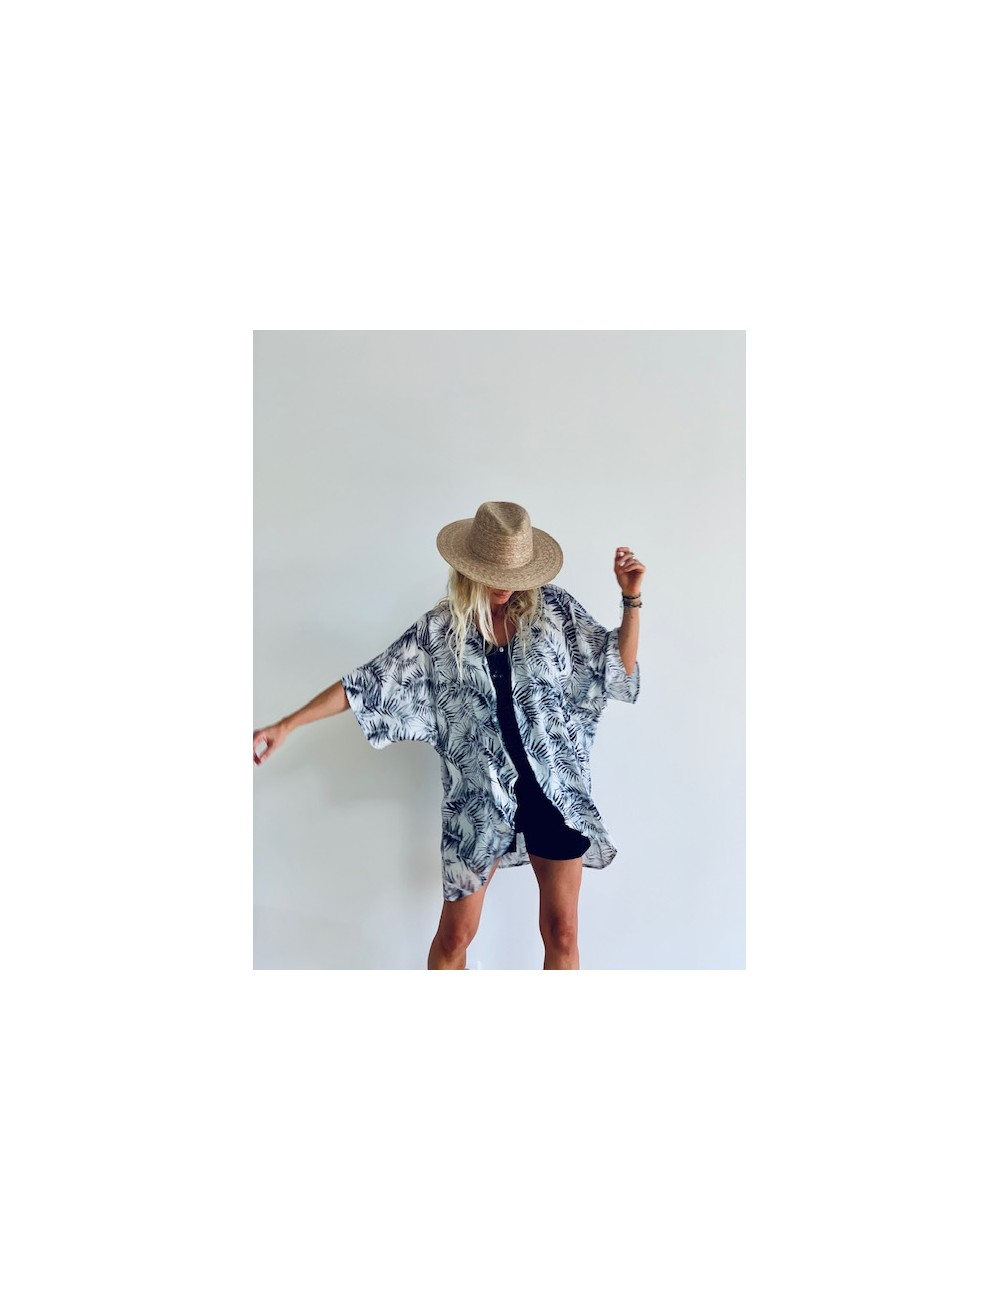 ROSA Kimono - ROCK N ROLLA Collection spring summer 2020 - Ematesse